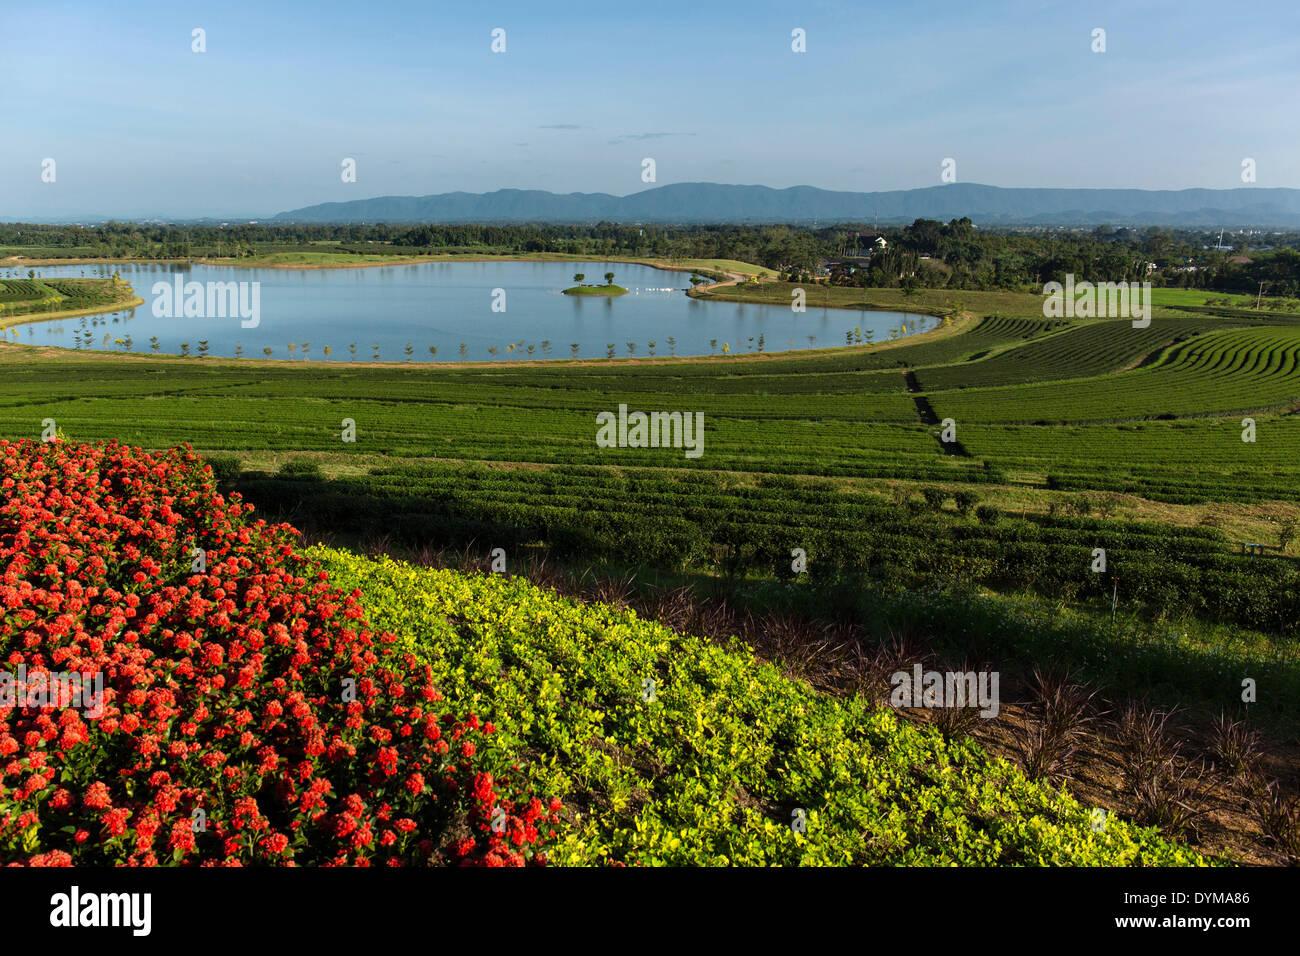 Boon Rawd granja, Singha Park, plantaciones de té con un lago, jardines de té, Chiang Rai, provincia de Chiang Rai, Tailandia del Norte Imagen De Stock